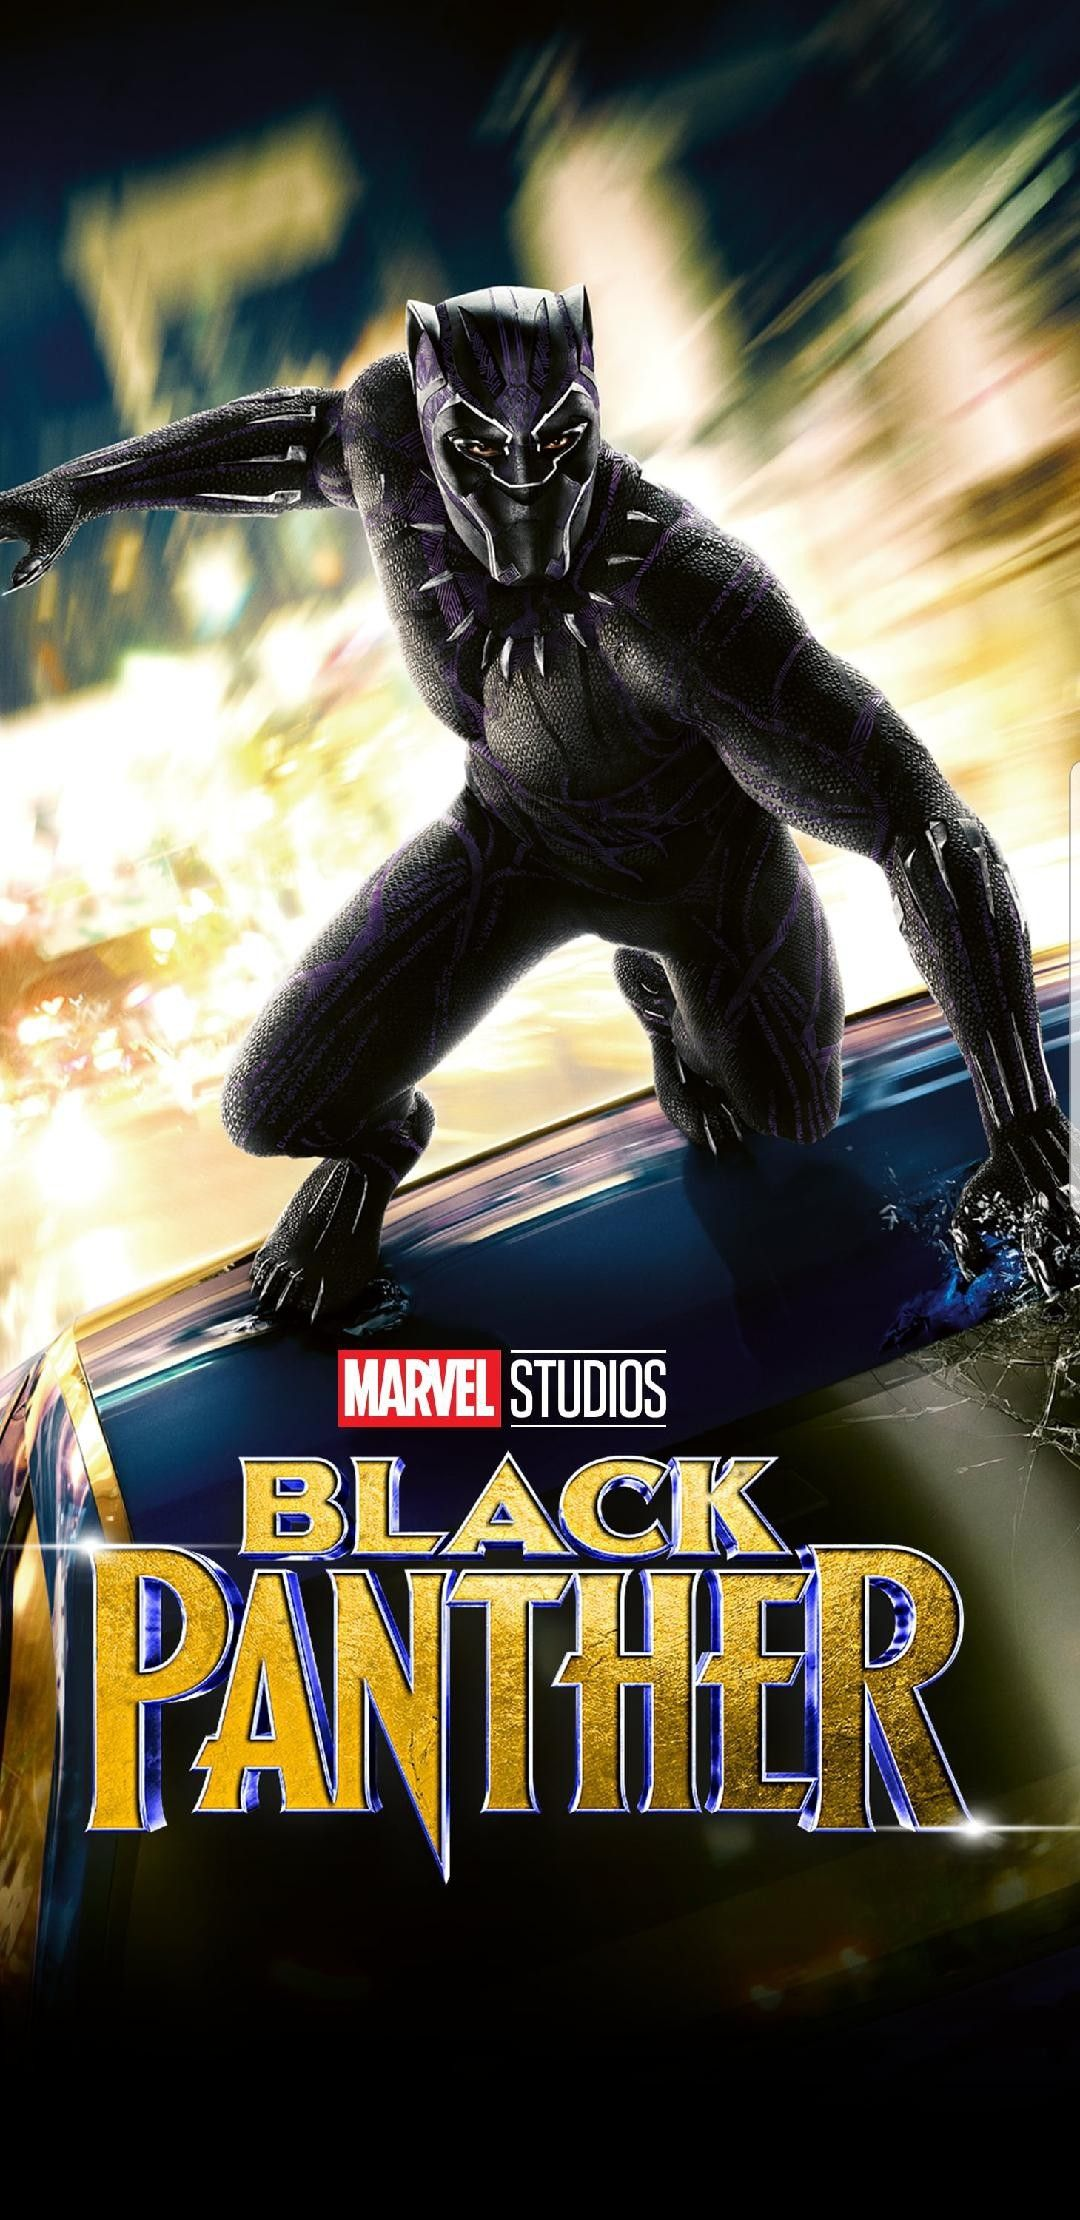 Pin De Bianca Lazarim Em Marvel Hq Studios Pantera Negra Pantera Filmes